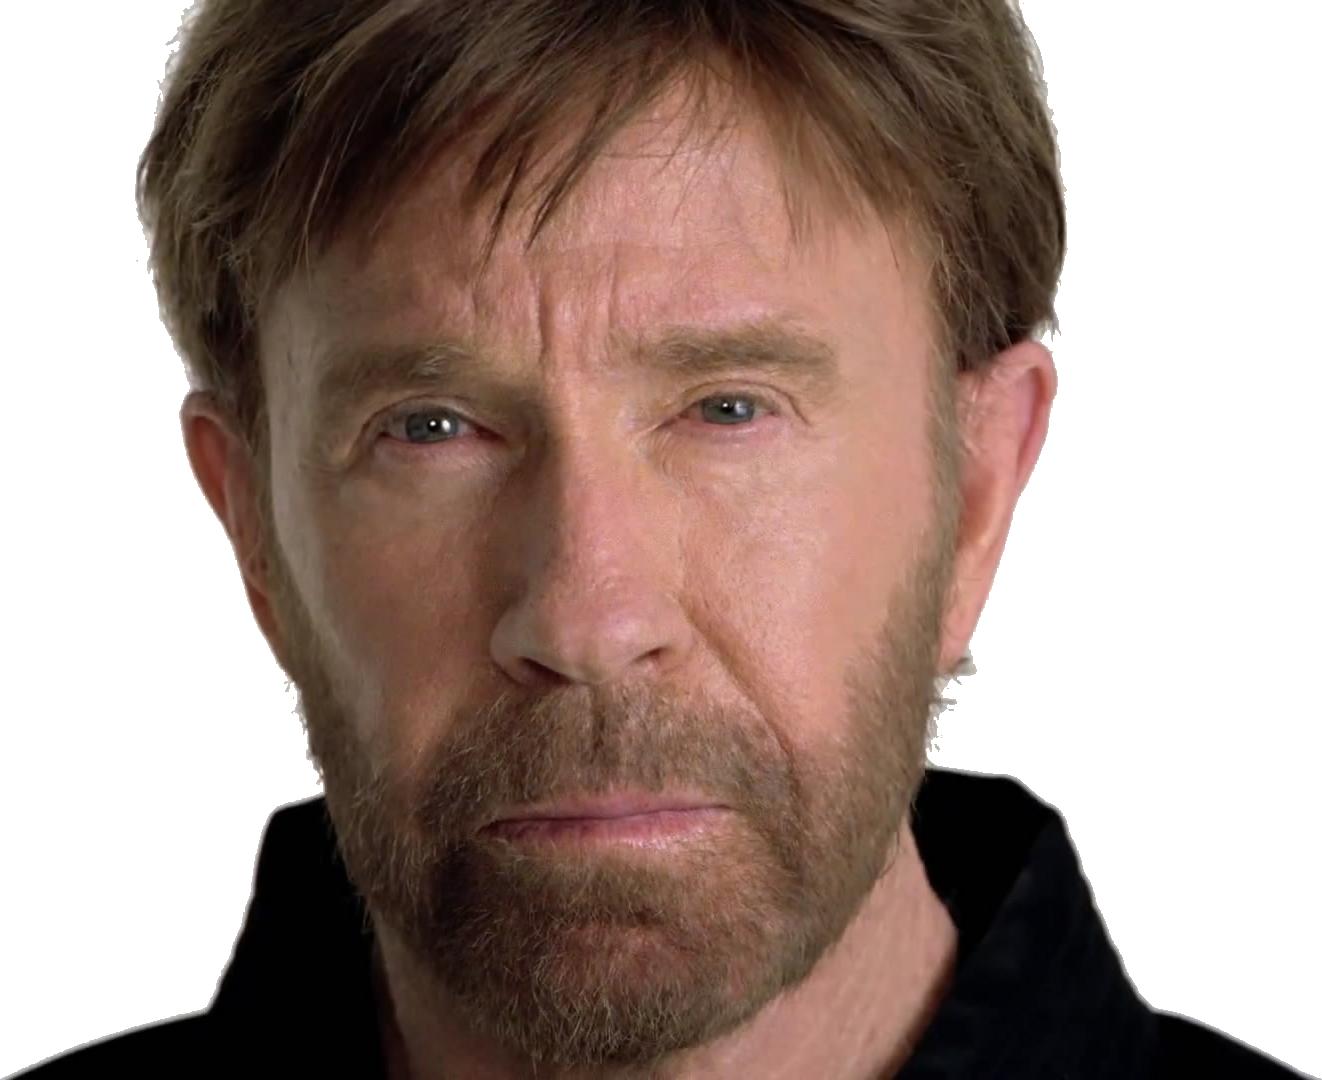 Chuck Norris Png Image Chuck Norris Jokes Chuck Norris Chuck Norris Facts